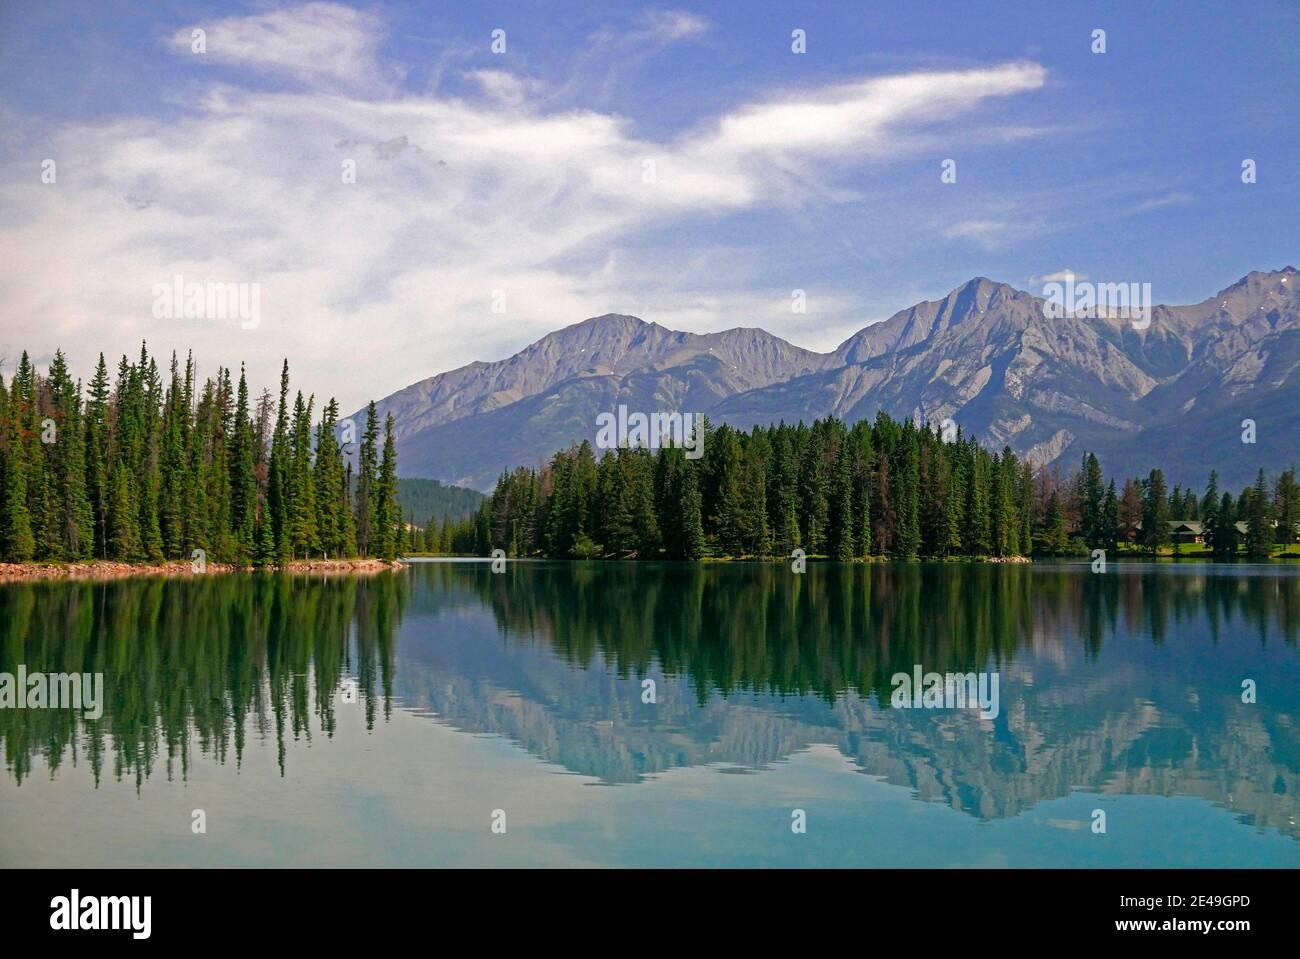 Lago Beauvert con Jasper Park Lodge cerca de Jasper, Parque Nacional Jasper, Montañas Rocosas, Alberta, Canadá Foto de stock